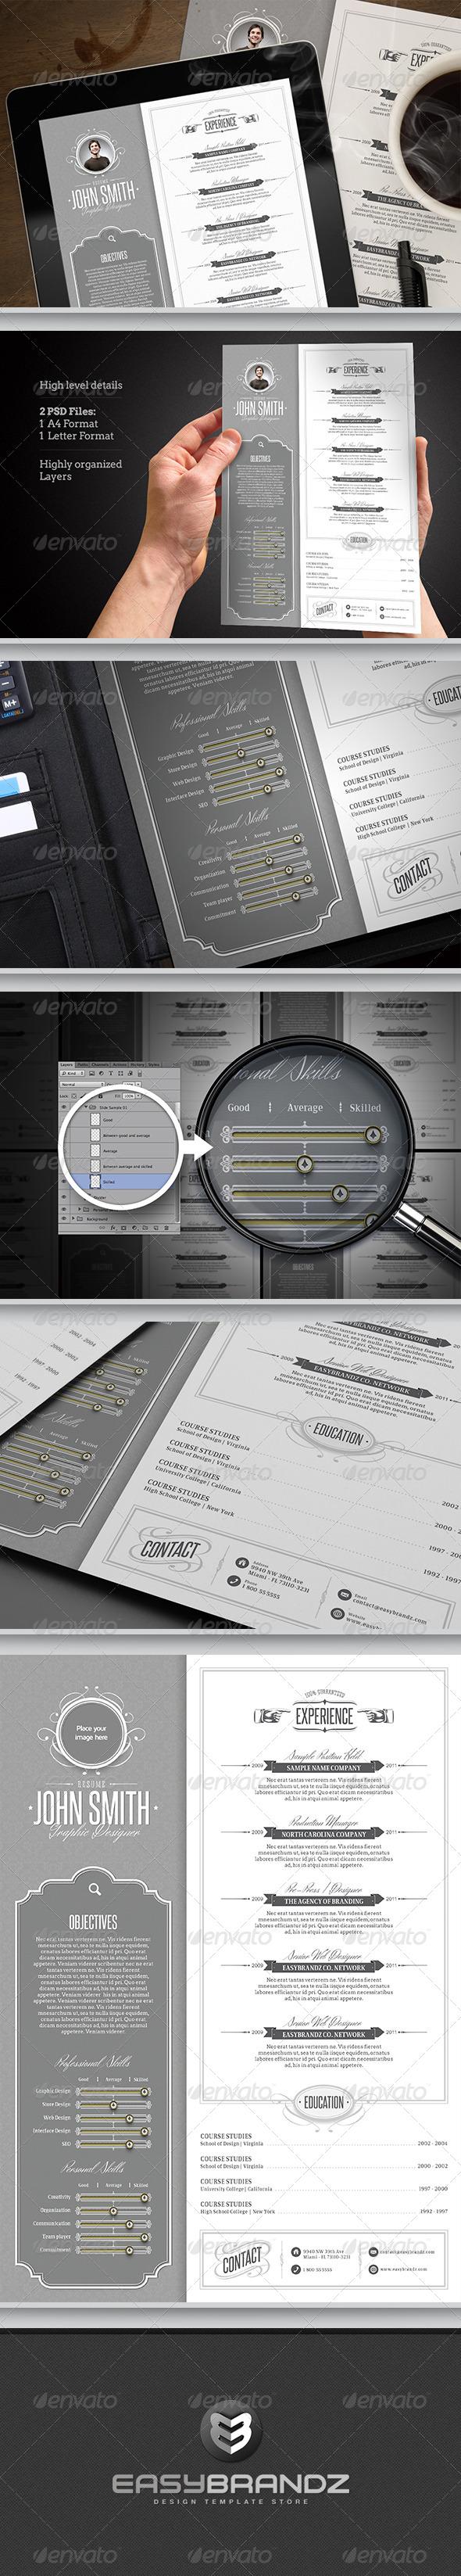 Retro Resume Template - Resumes Stationery